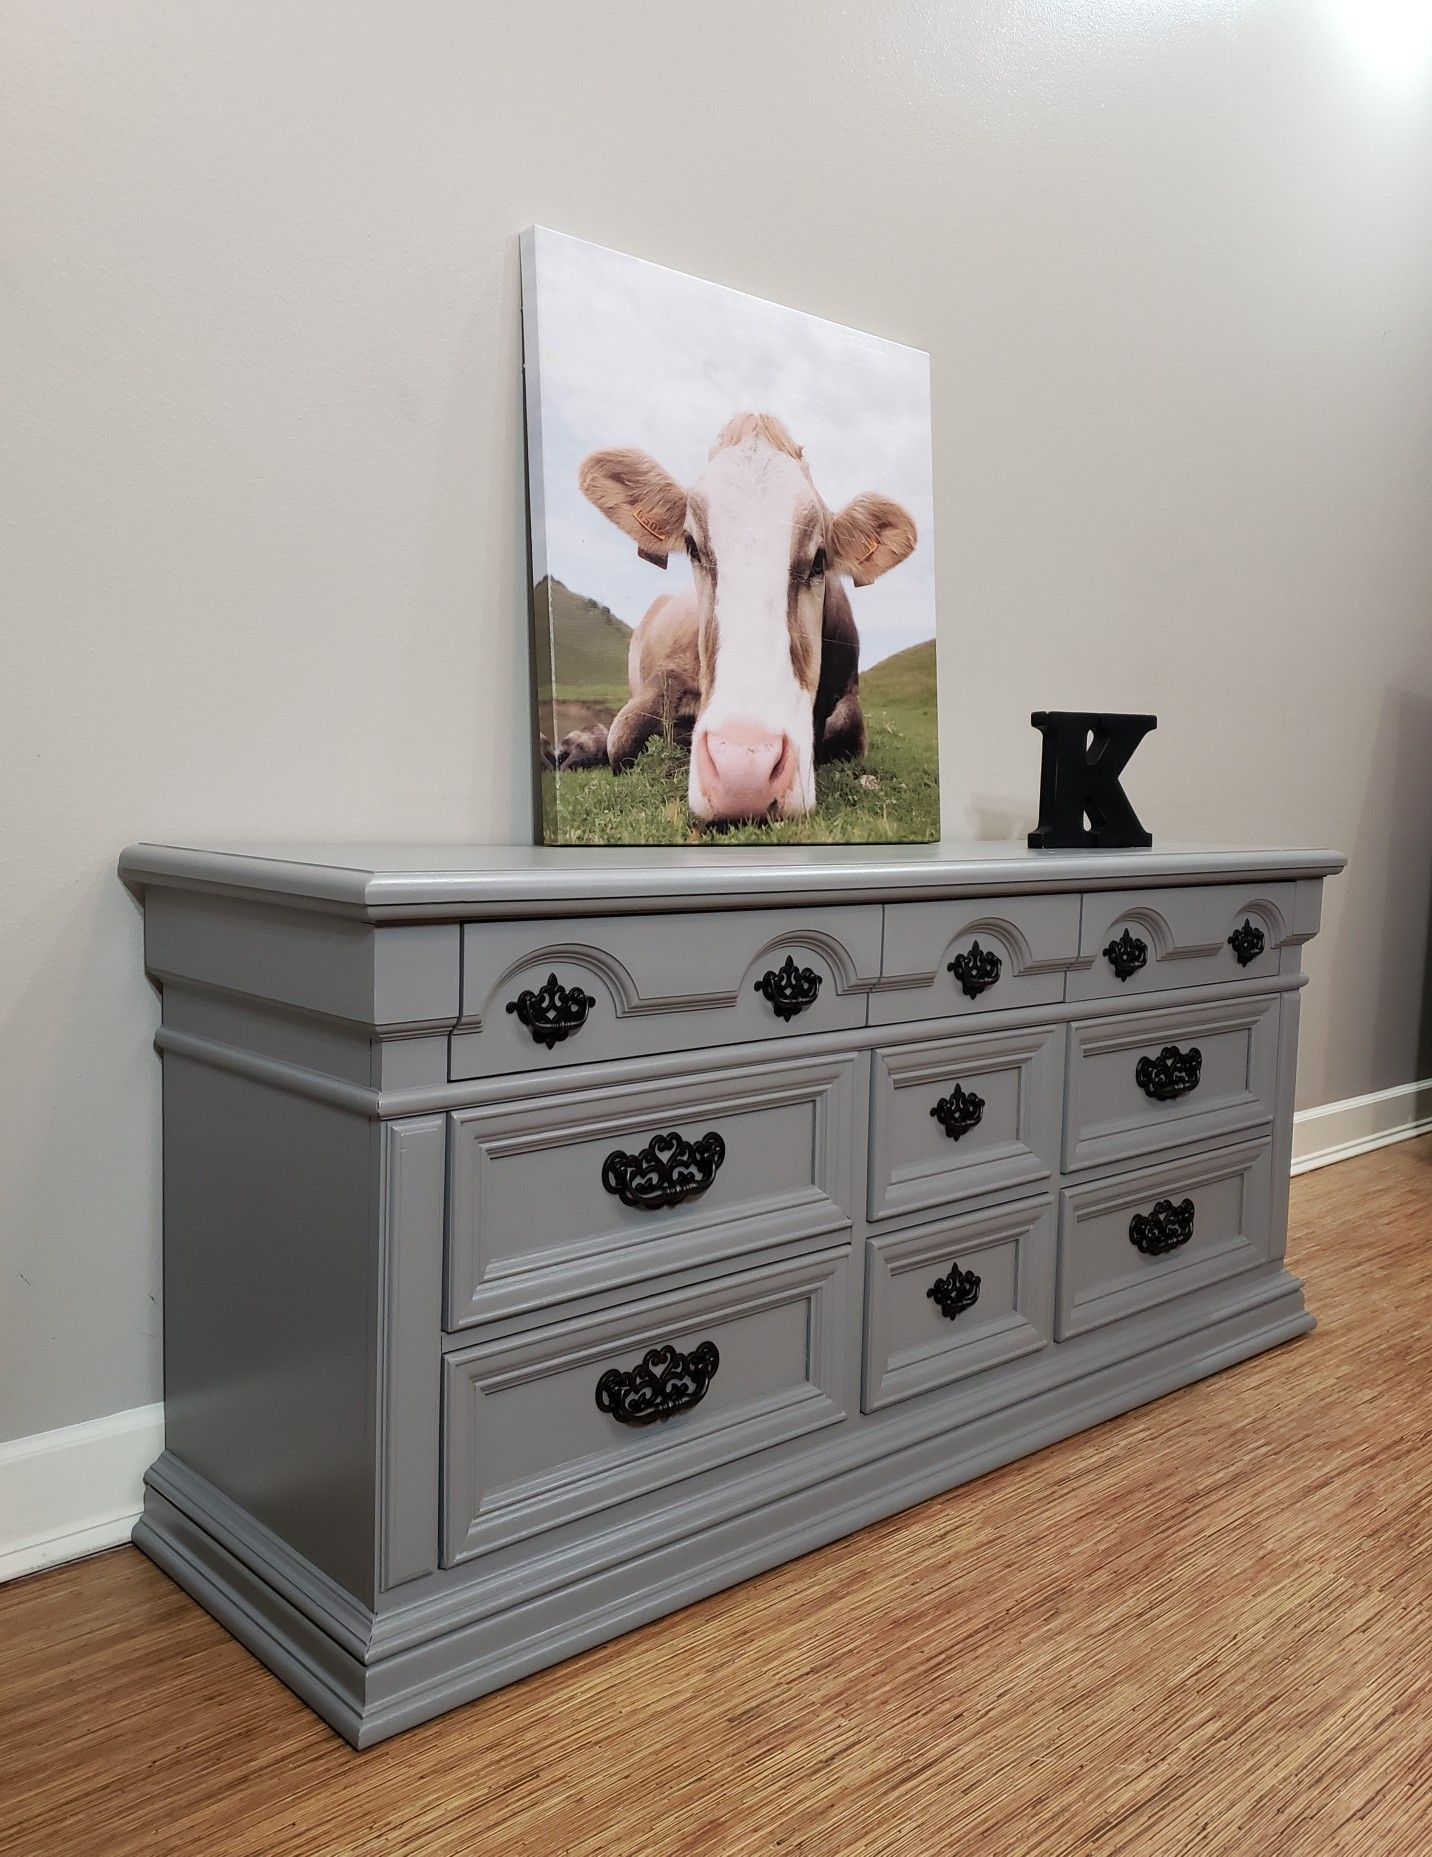 Beautiful hand painted Thomasville dresser